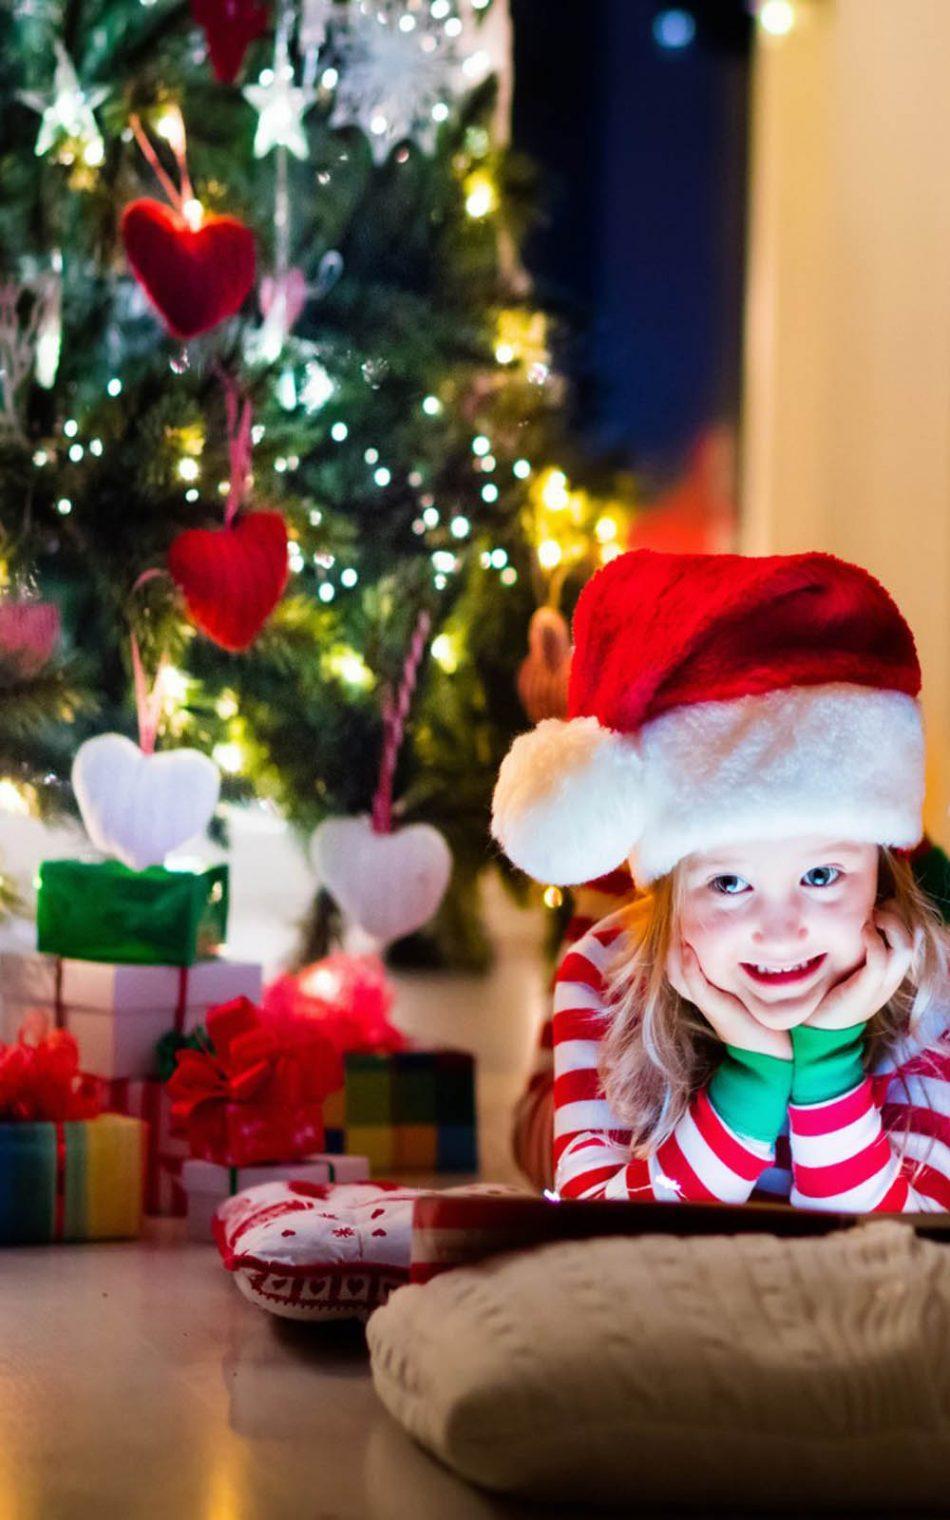 Christmas Cute Kid Wearing Santa Hat HD Mobile Wallpaper